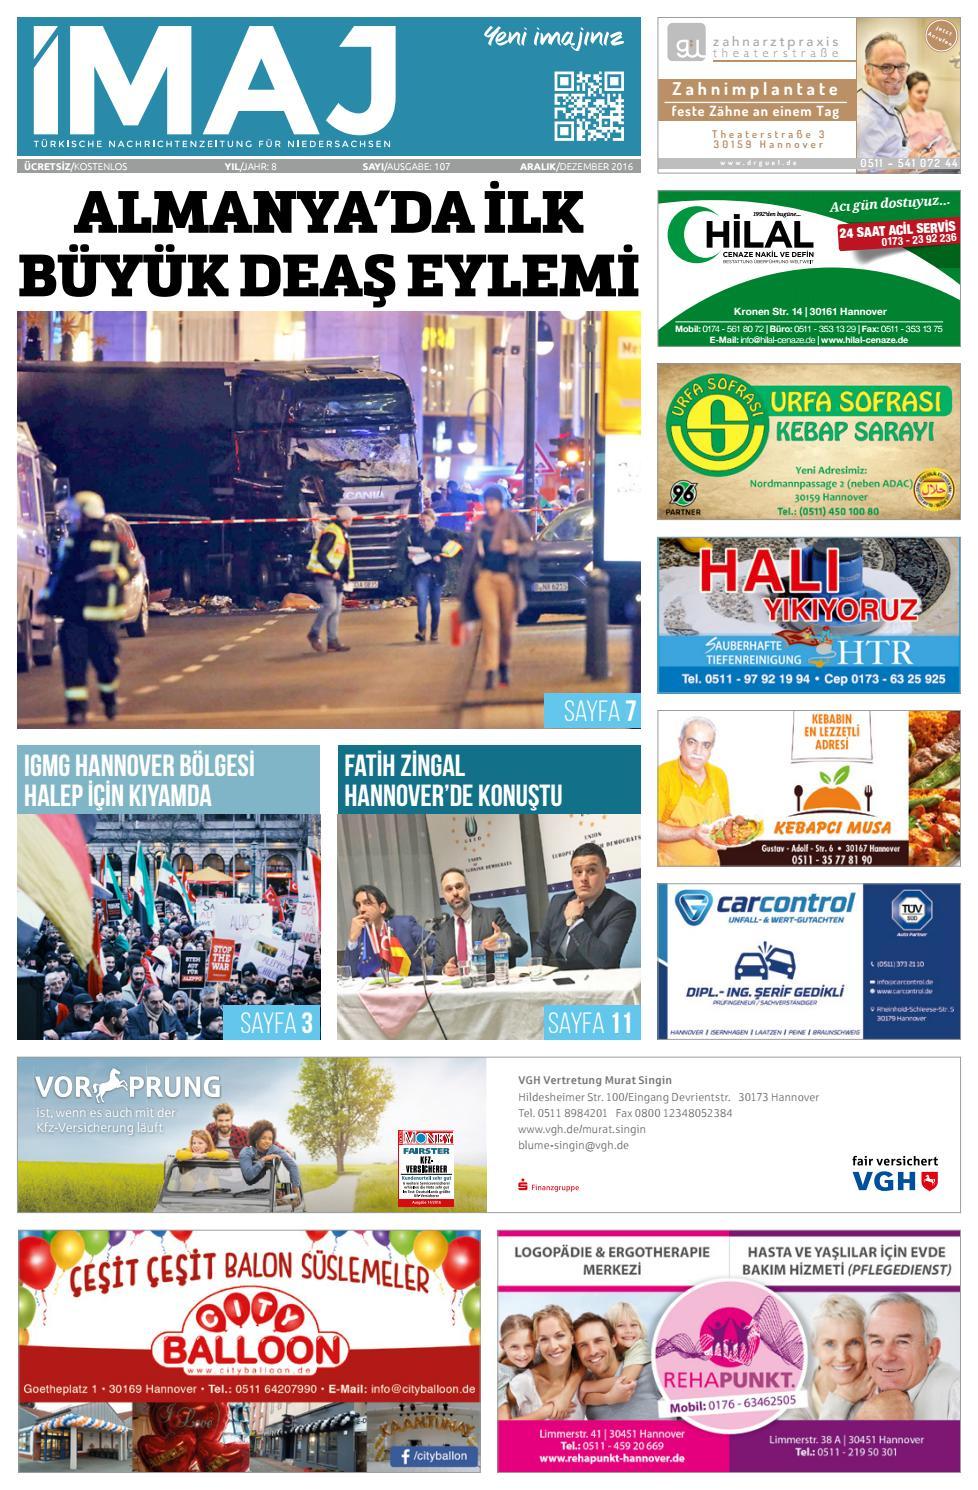 Imaj Gazetesi 107 Sayisi Aralik 2016 By Imajgazetesi Issuu